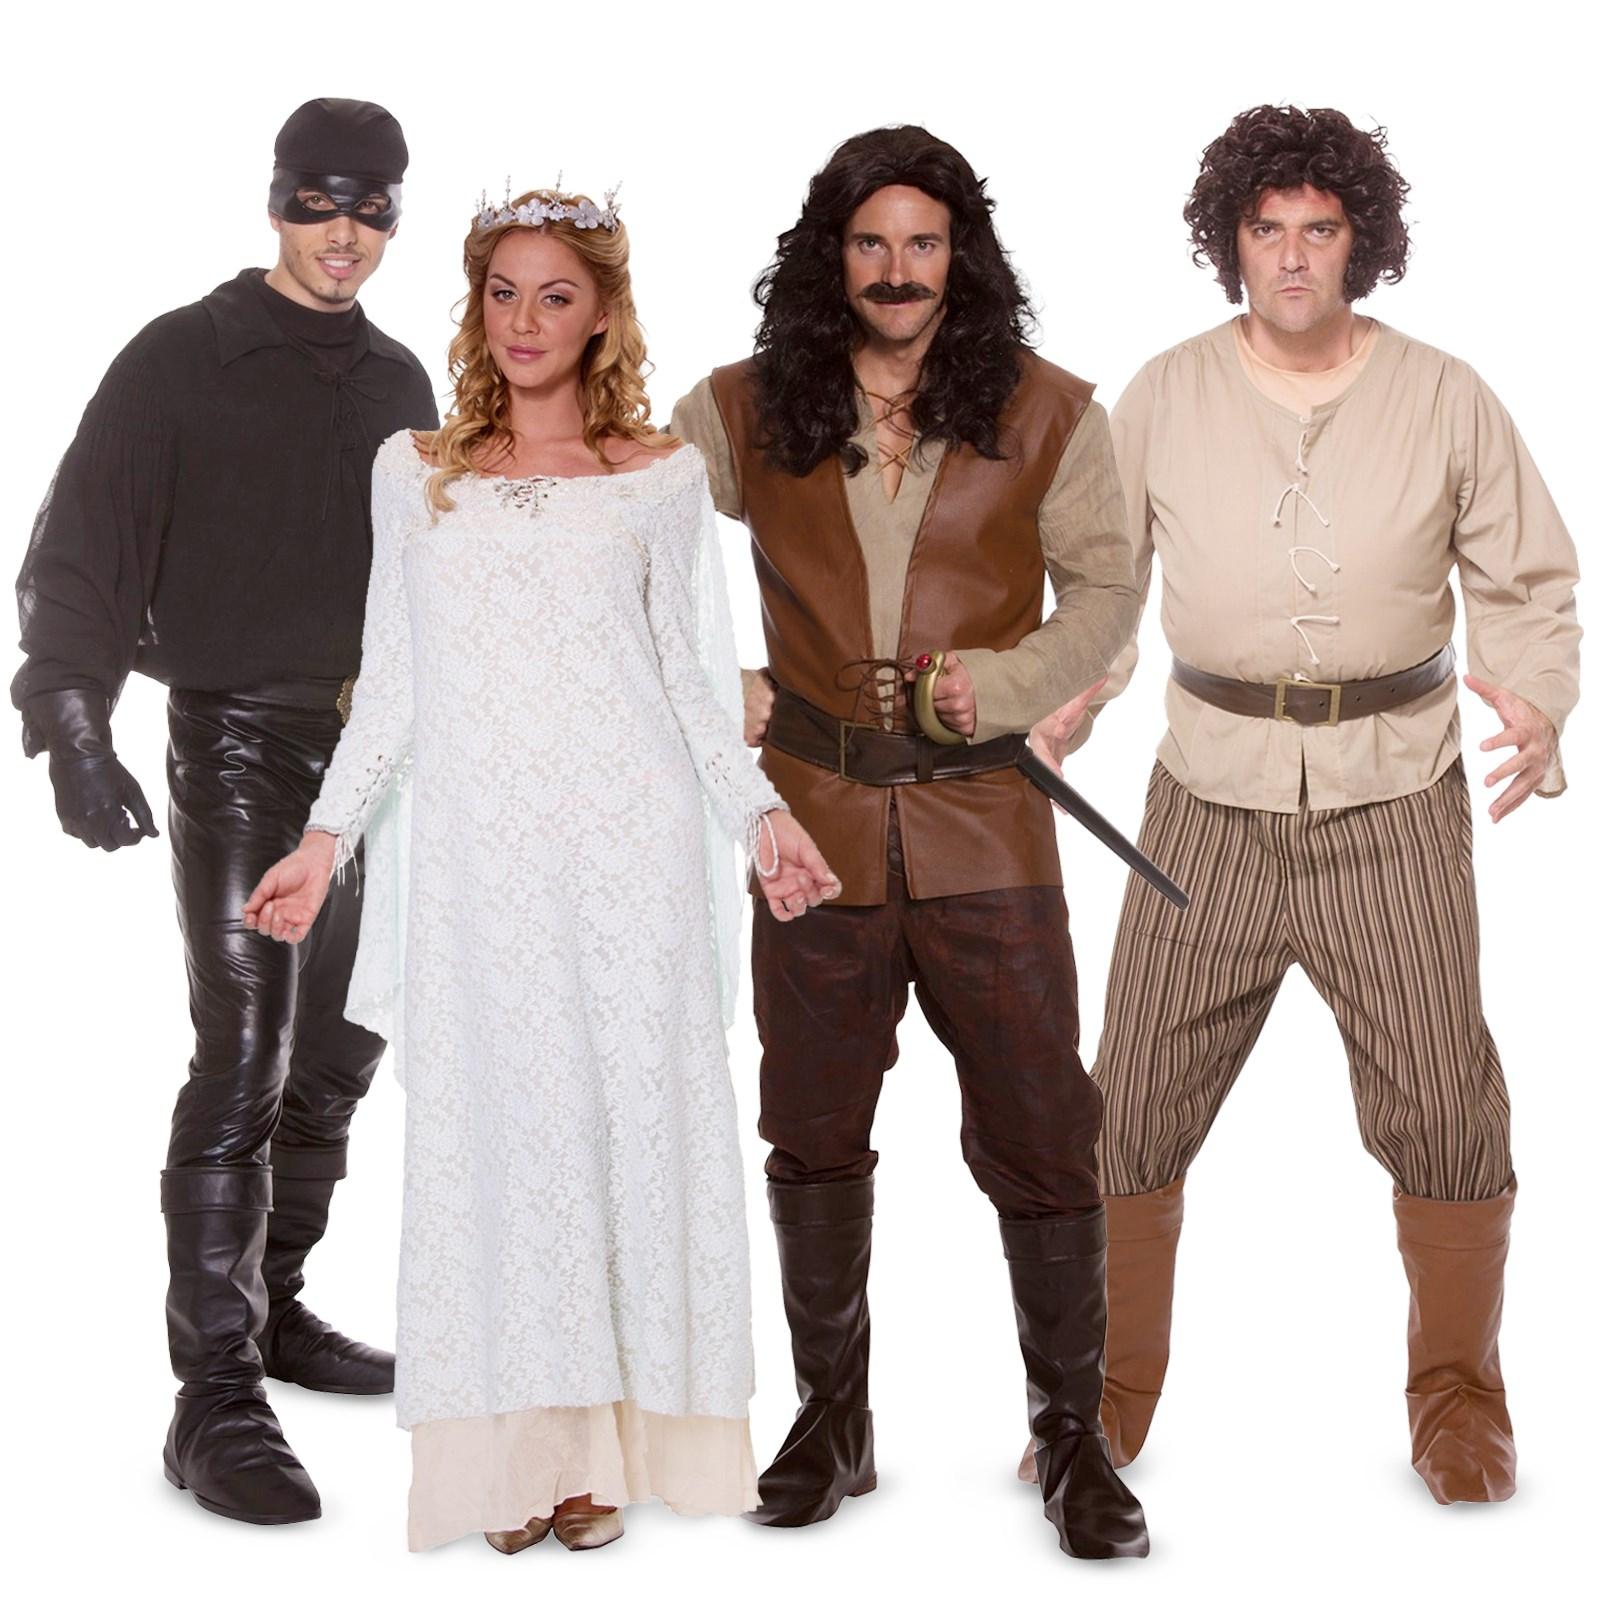 Princess Bride Group Costumes | BuyCostumes.com